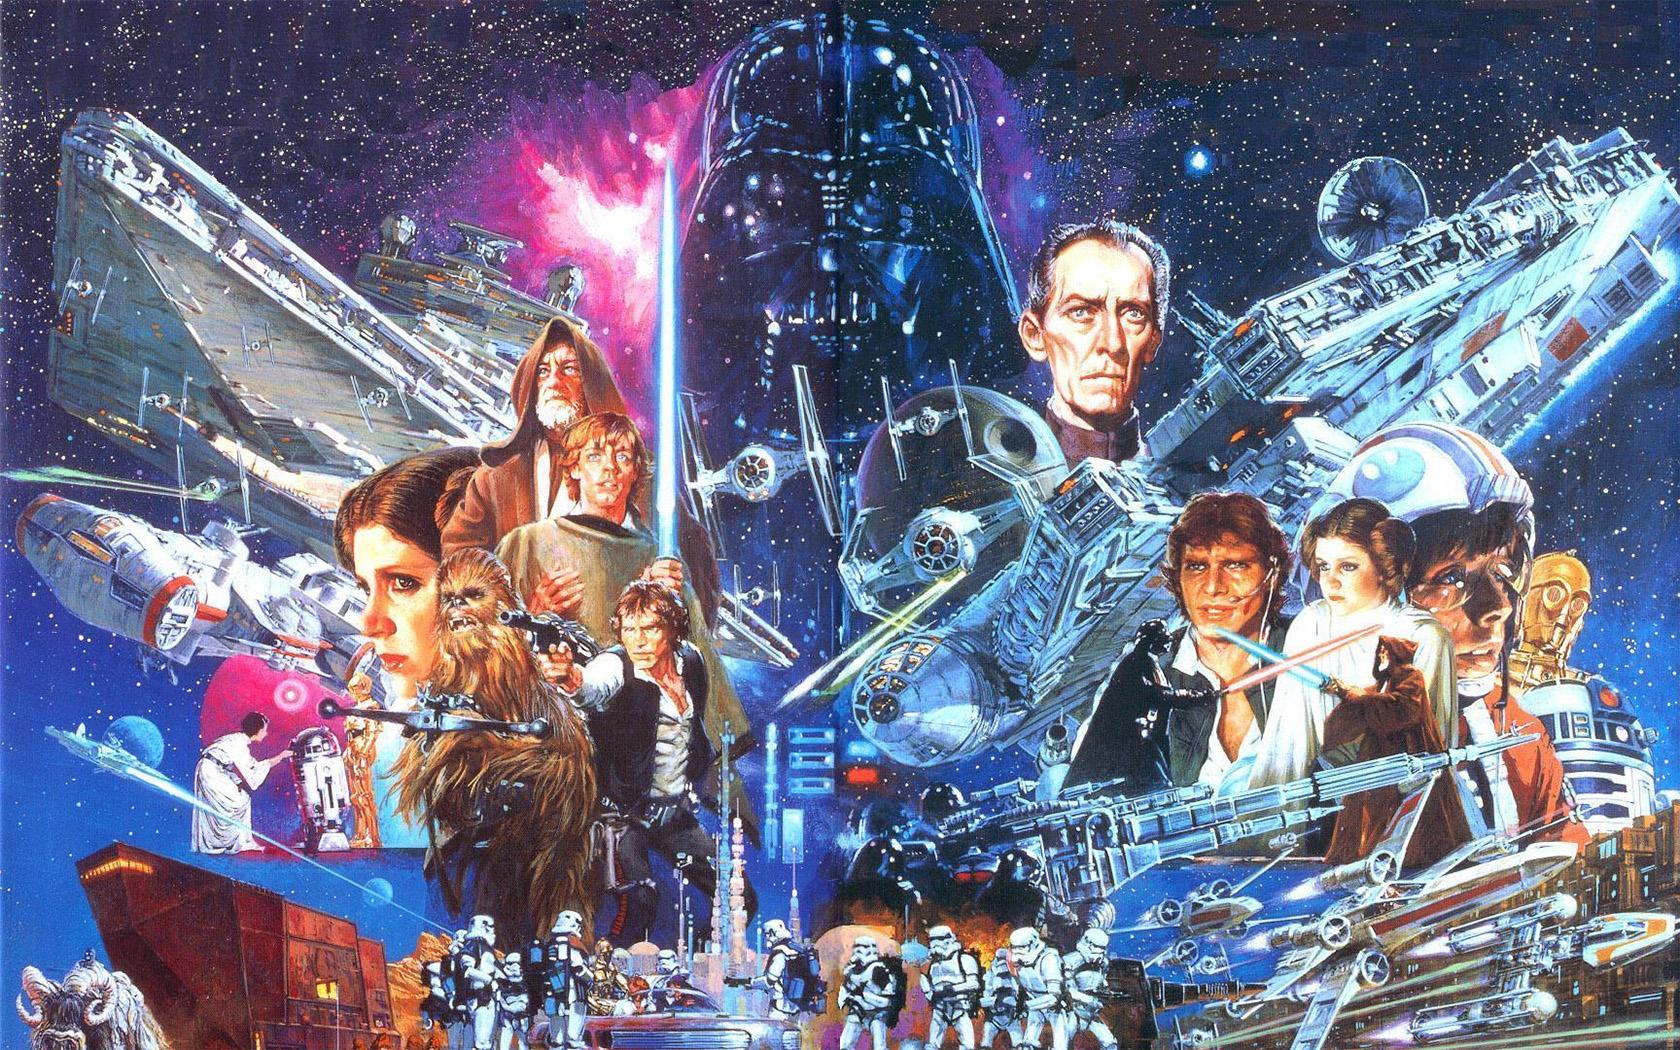 Star wars movie poster wallpaper wallpapersafari - Movie poster wallpaper ...